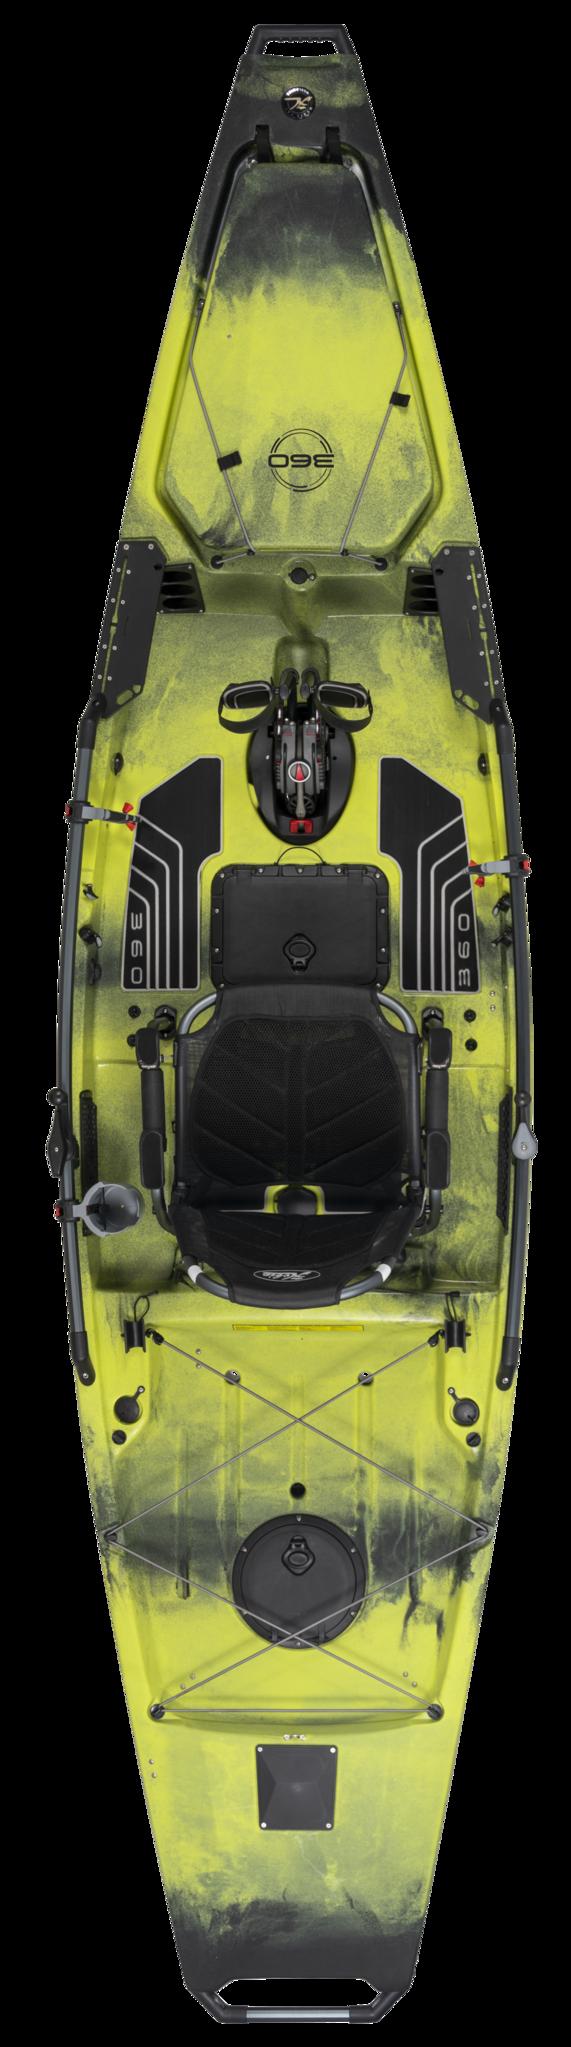 Hobie Cat Company Hobie Mirage 360 Pro Angler